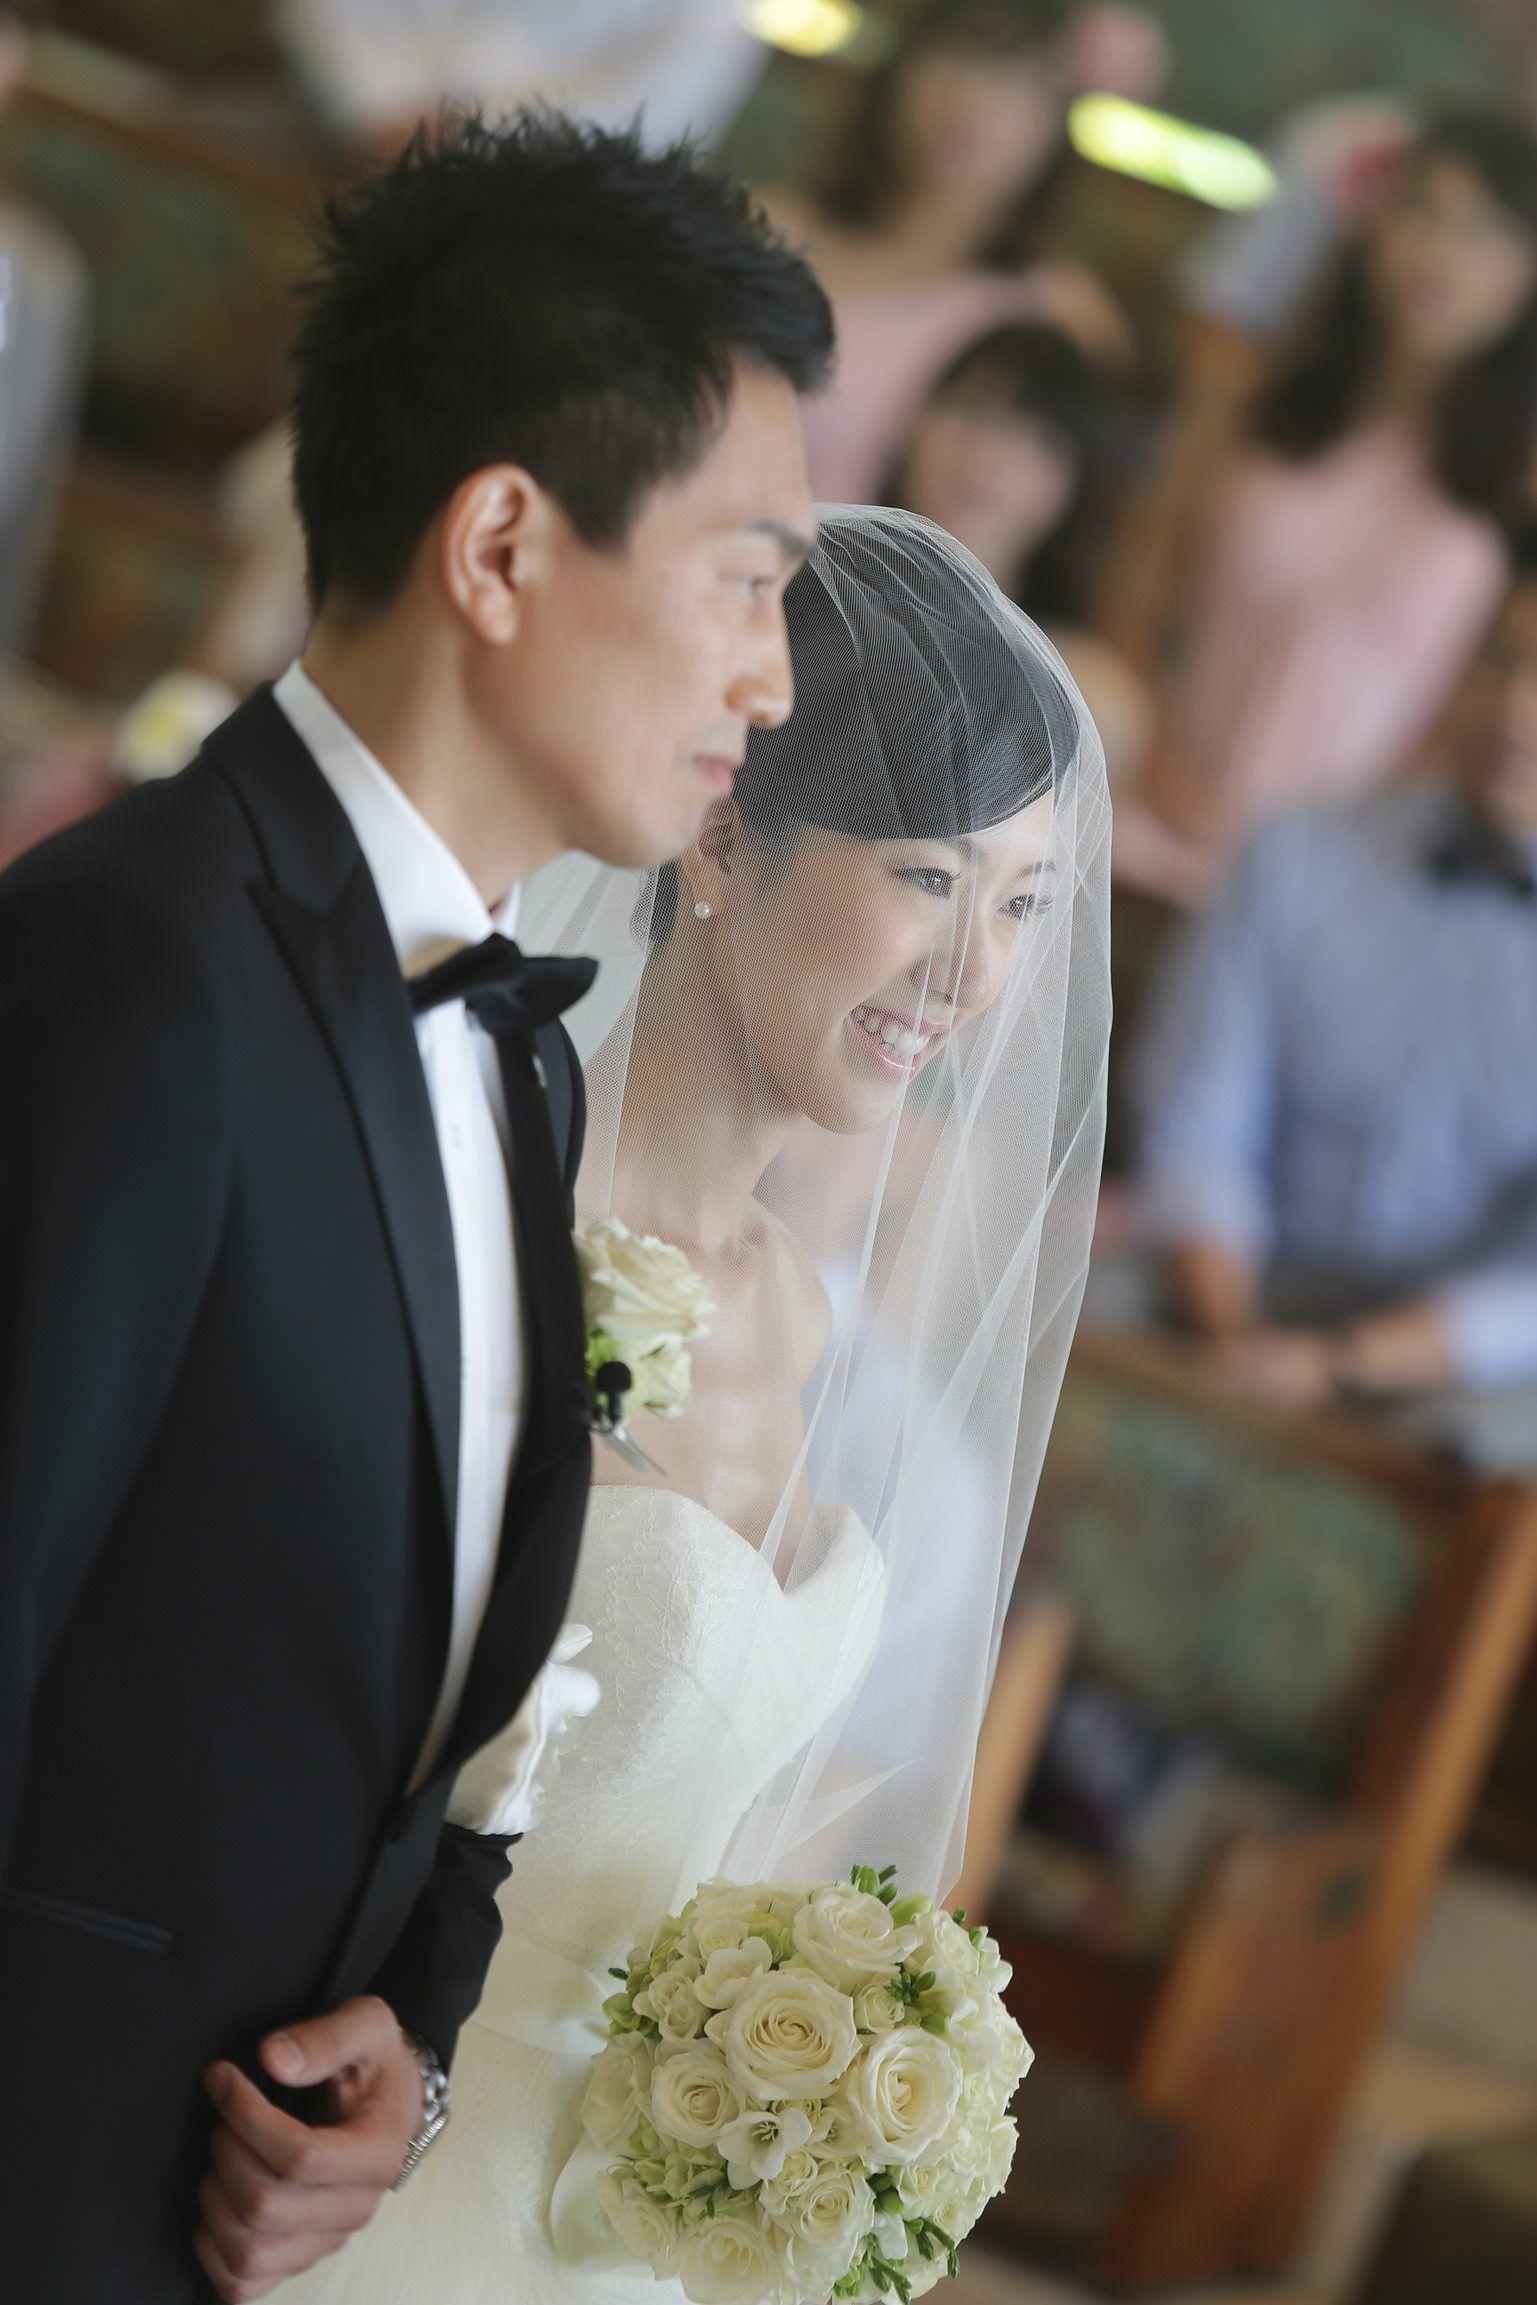 Photography: Global Pictures | Katsuya #ハワイ #ハワイ挙式 #海外ウエディング